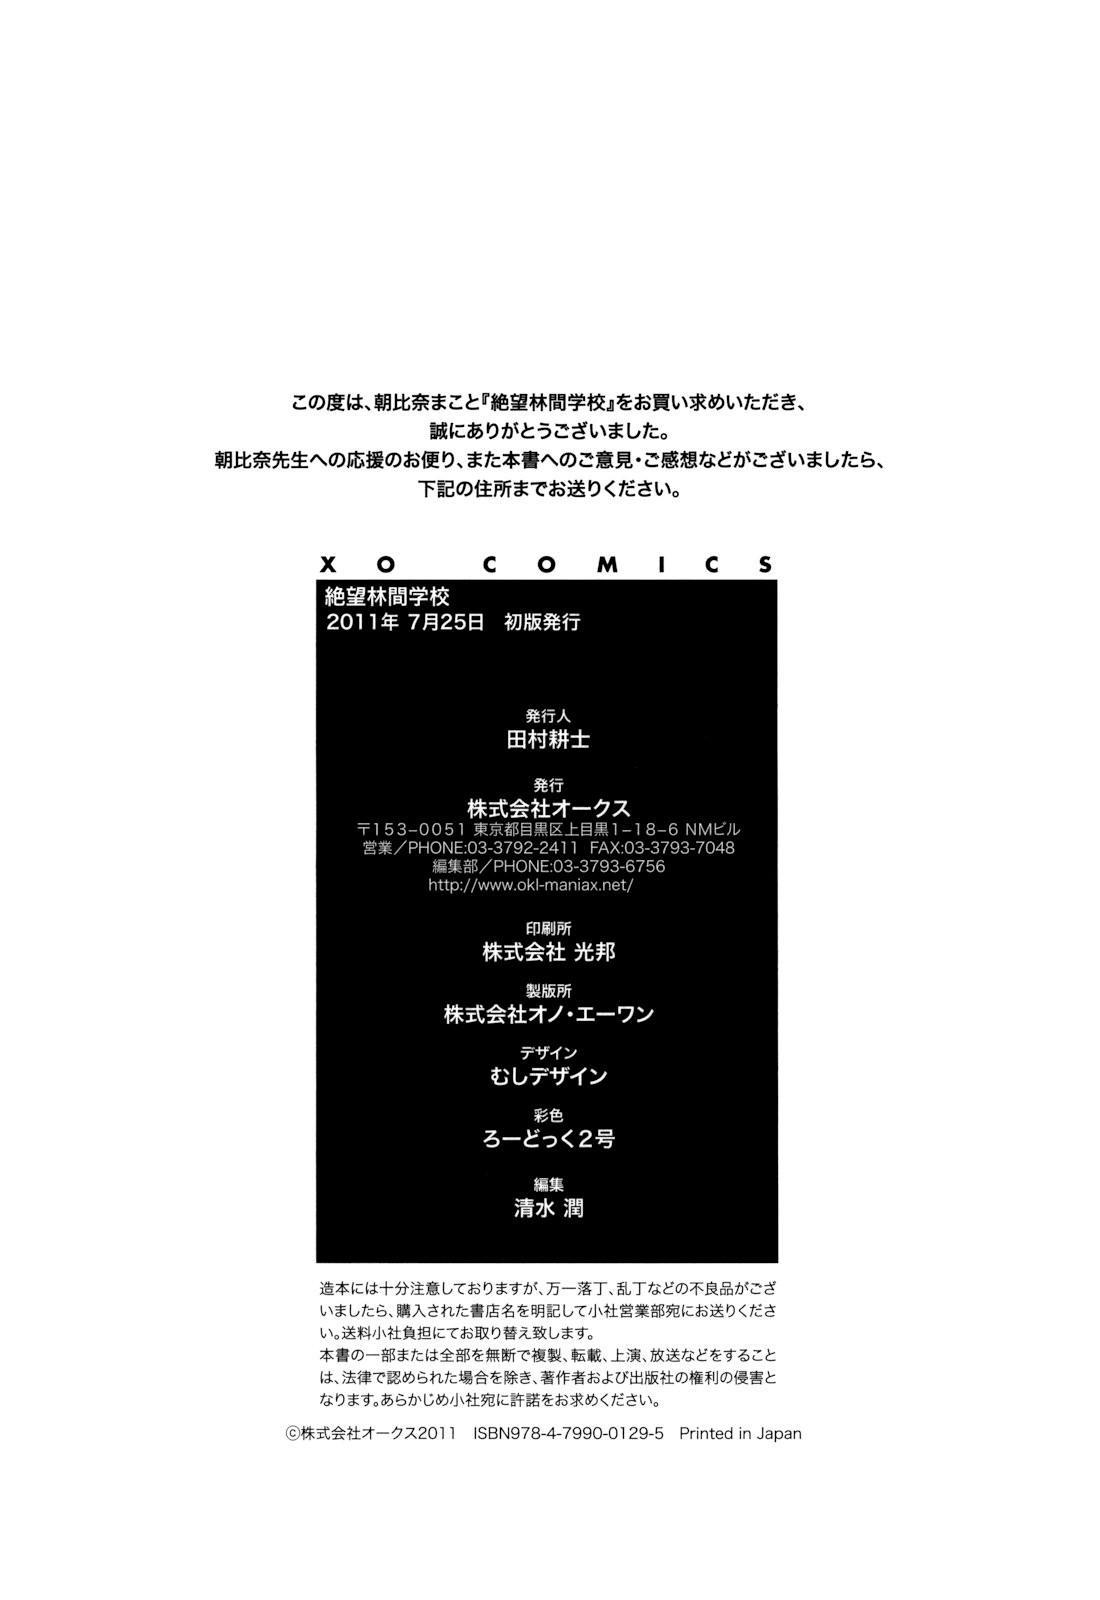 Zetsubou Rinkan Gakkou 182